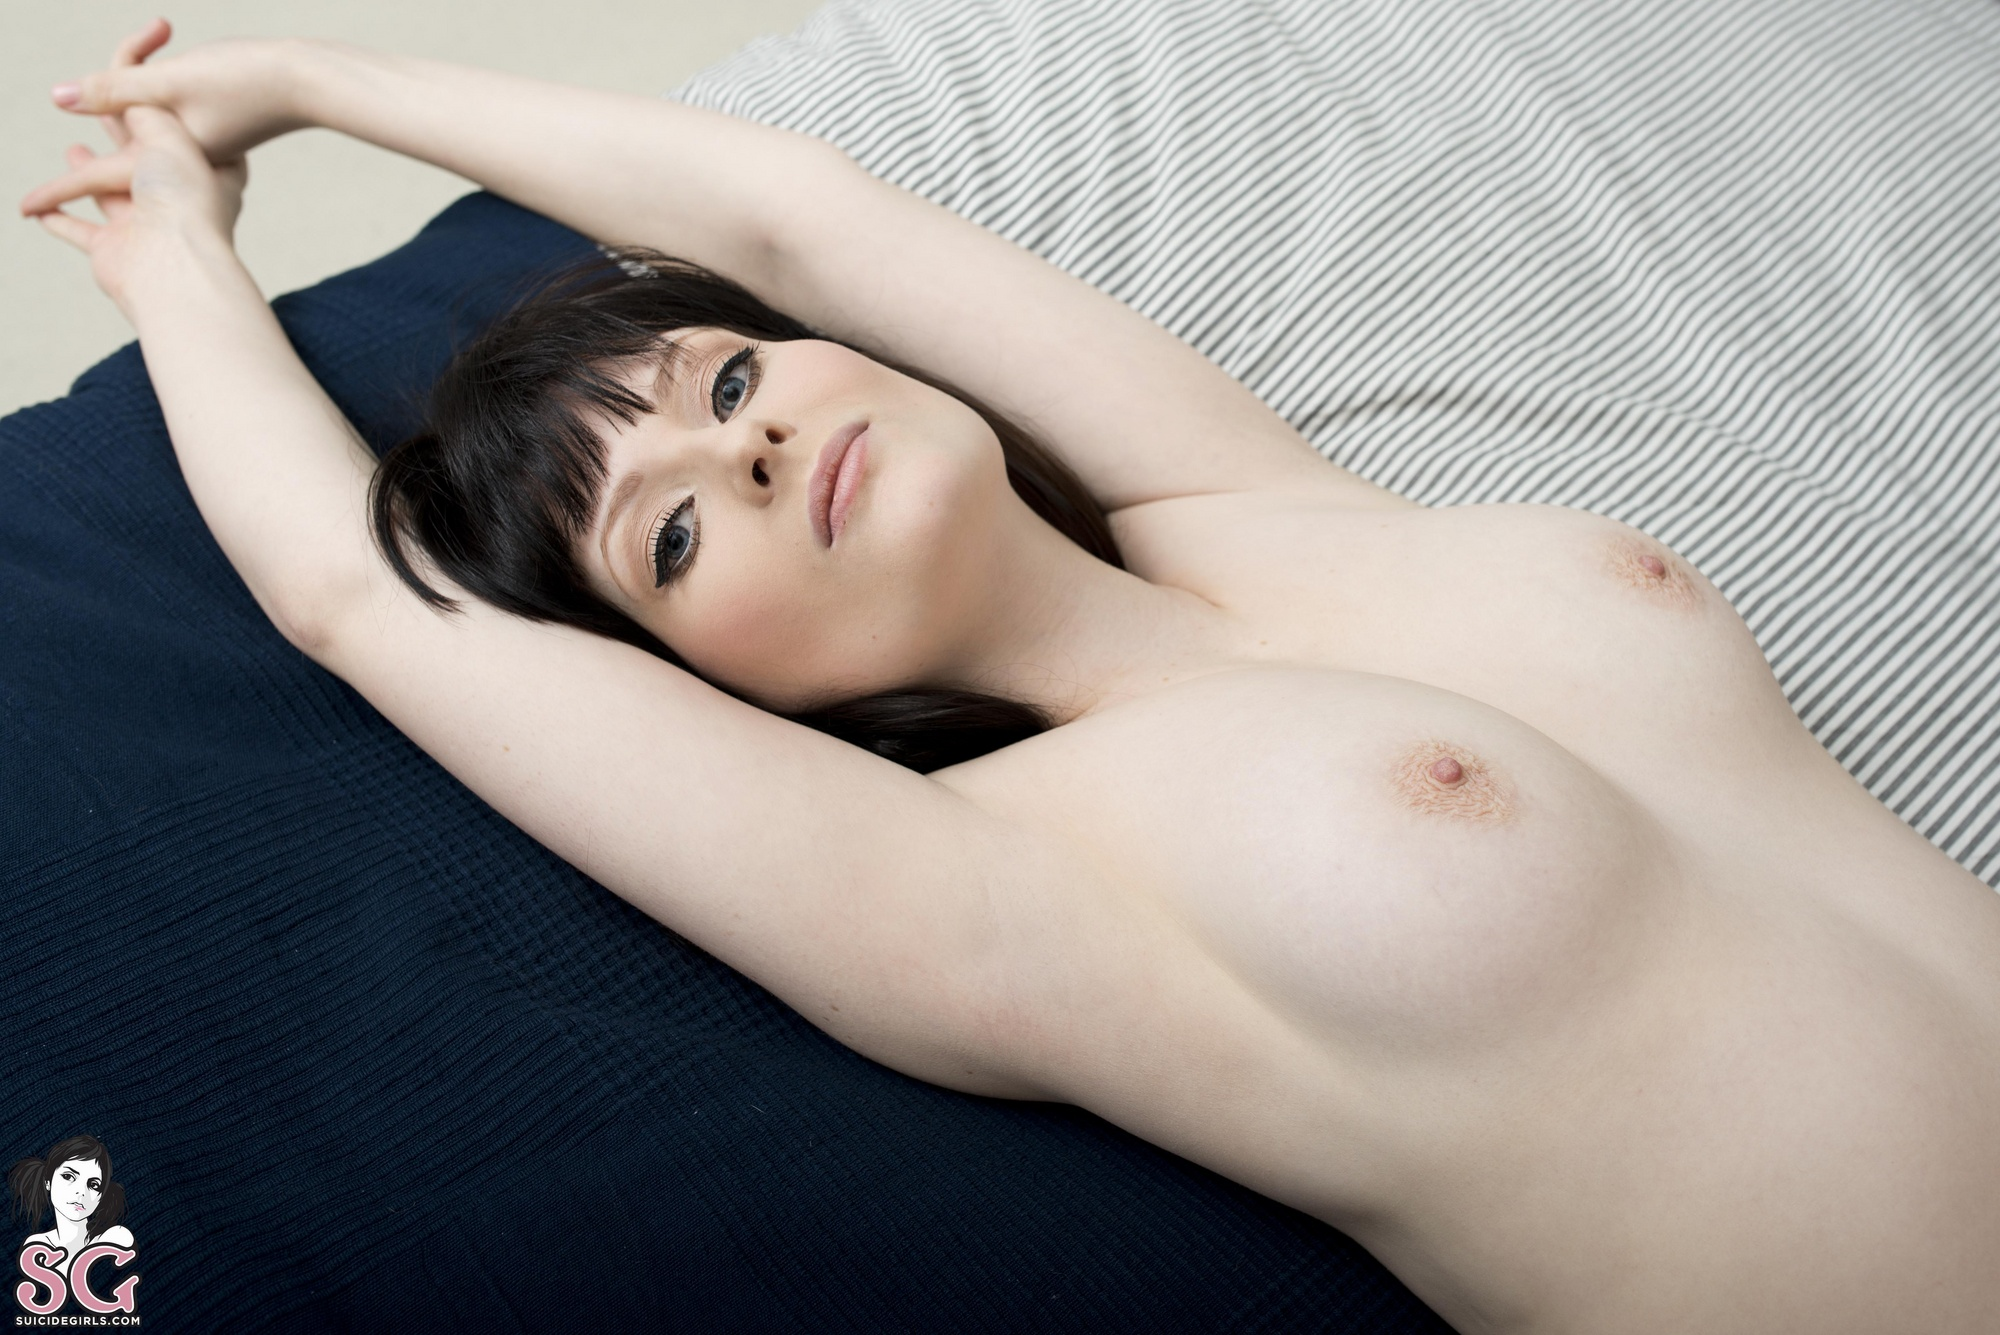 Jessica lou nude socks suicide girls 22 RedBust